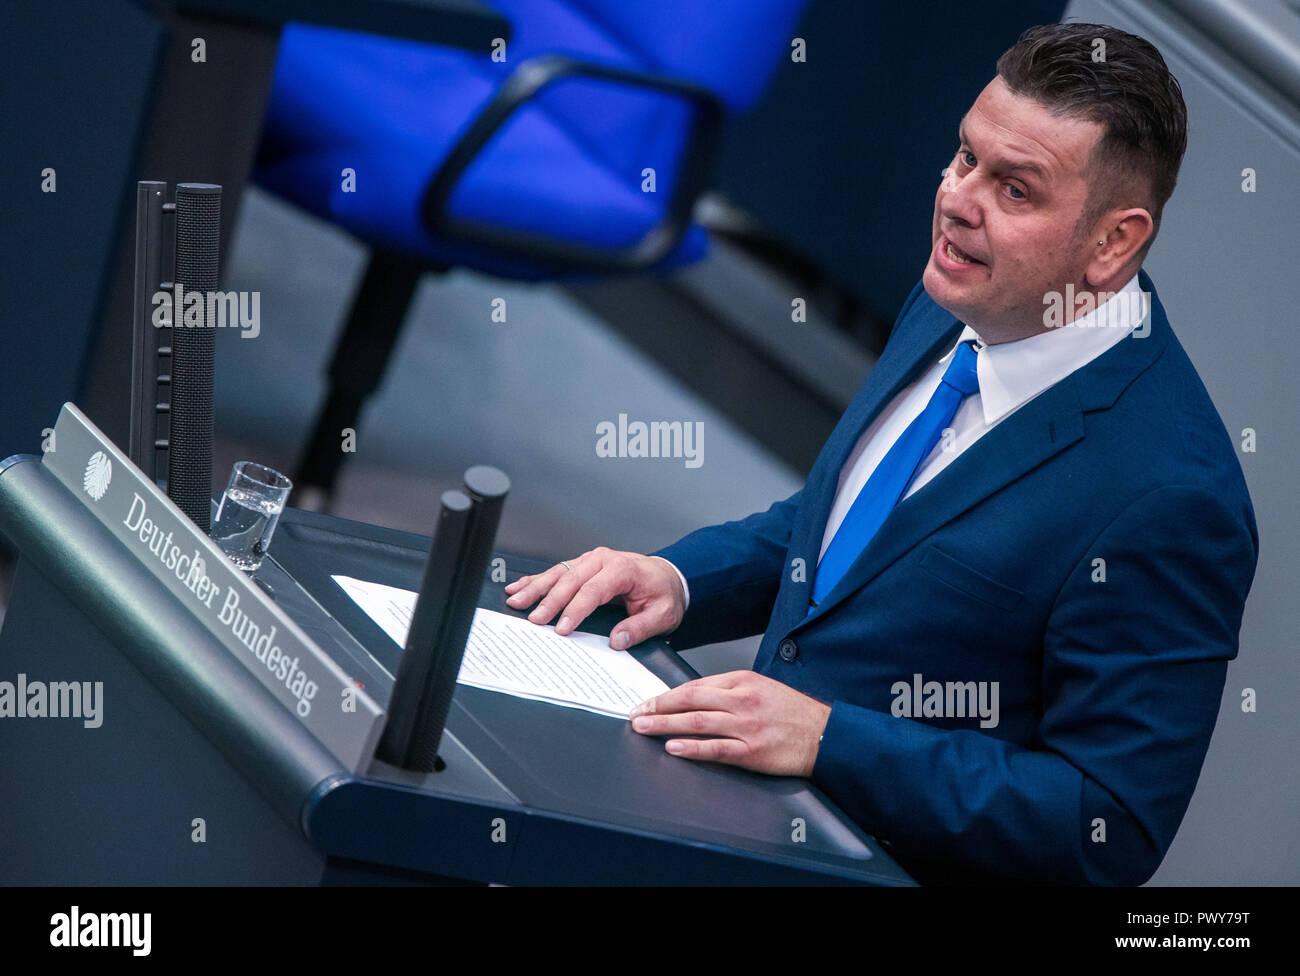 Berlin, Germany. 18th Oct, 2018. Lars Herrmann, member of the Bundestag of the AfD parliamentary group, speaks in the Bundestag. Credit: Jens Büttner/dpa-Zentralbild/dpa/Alamy Live News - Stock Image